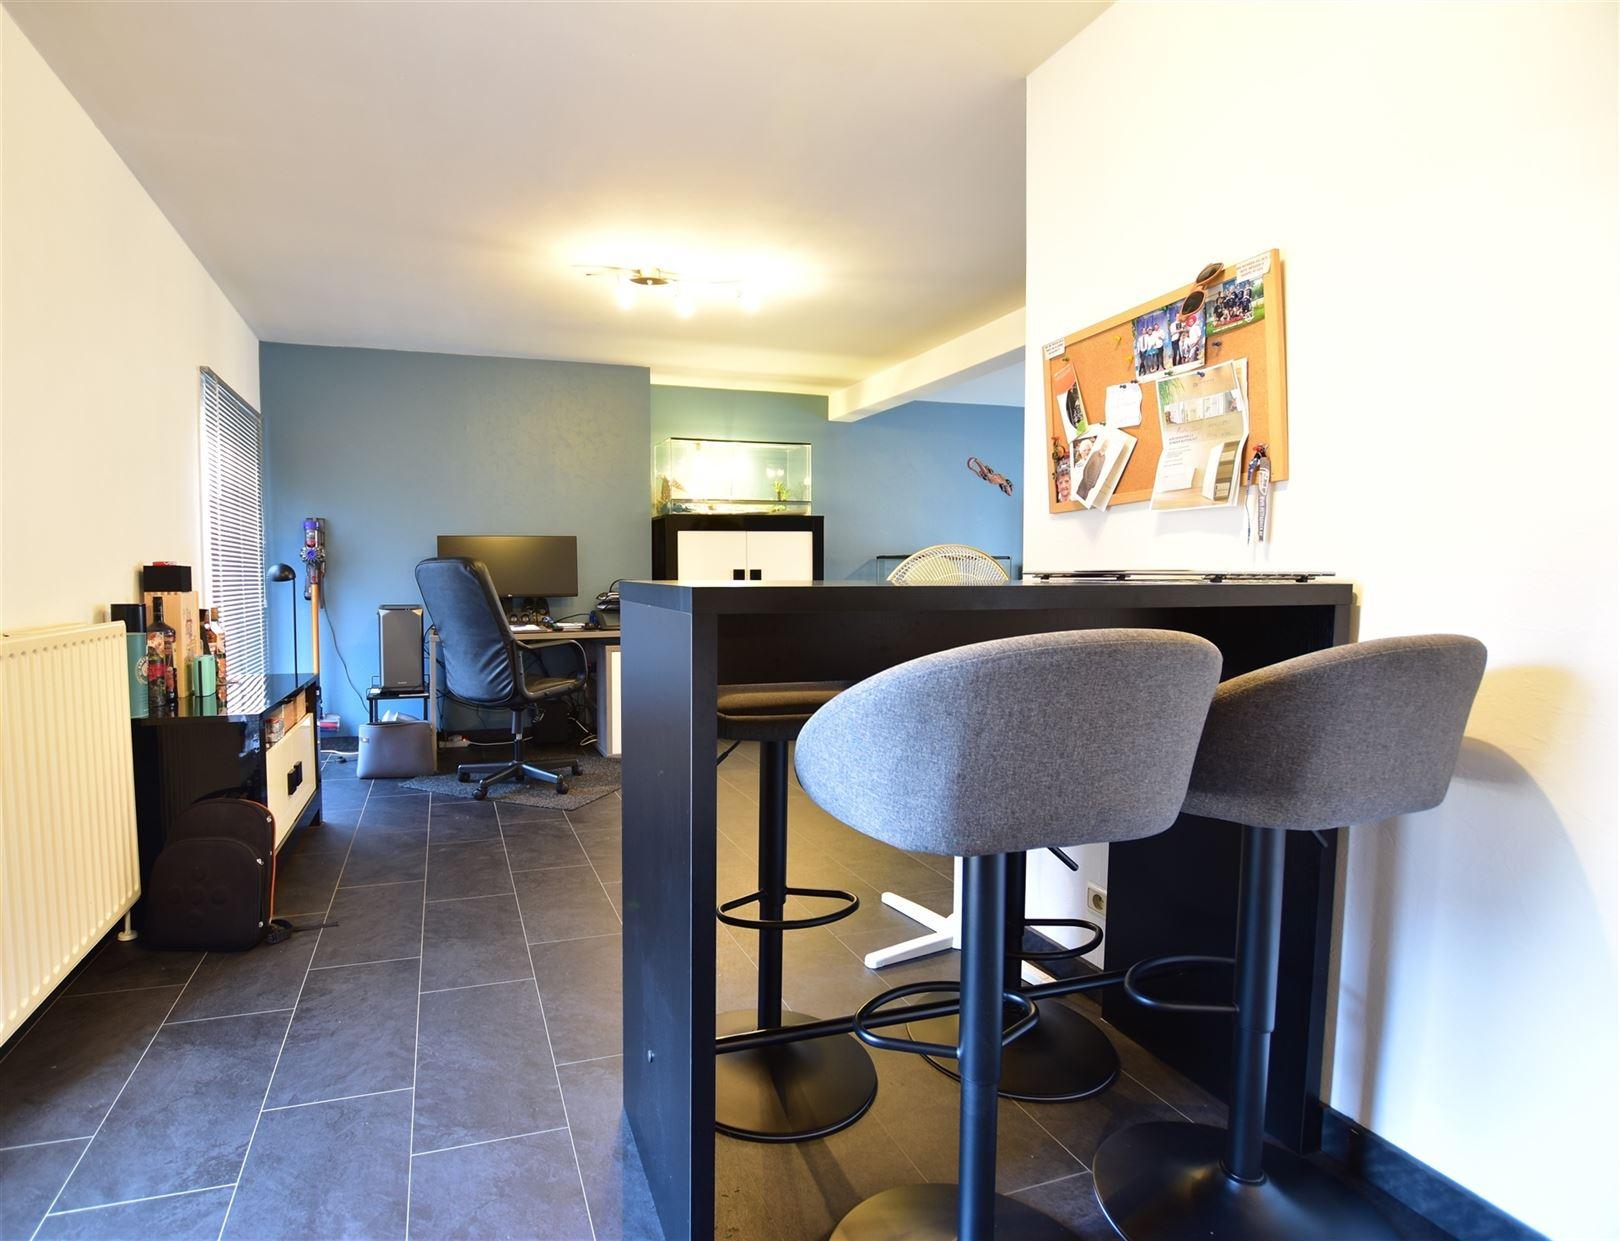 Foto 7 : Duplex/triplex te 9200 BAASRODE (België) - Prijs € 159.000